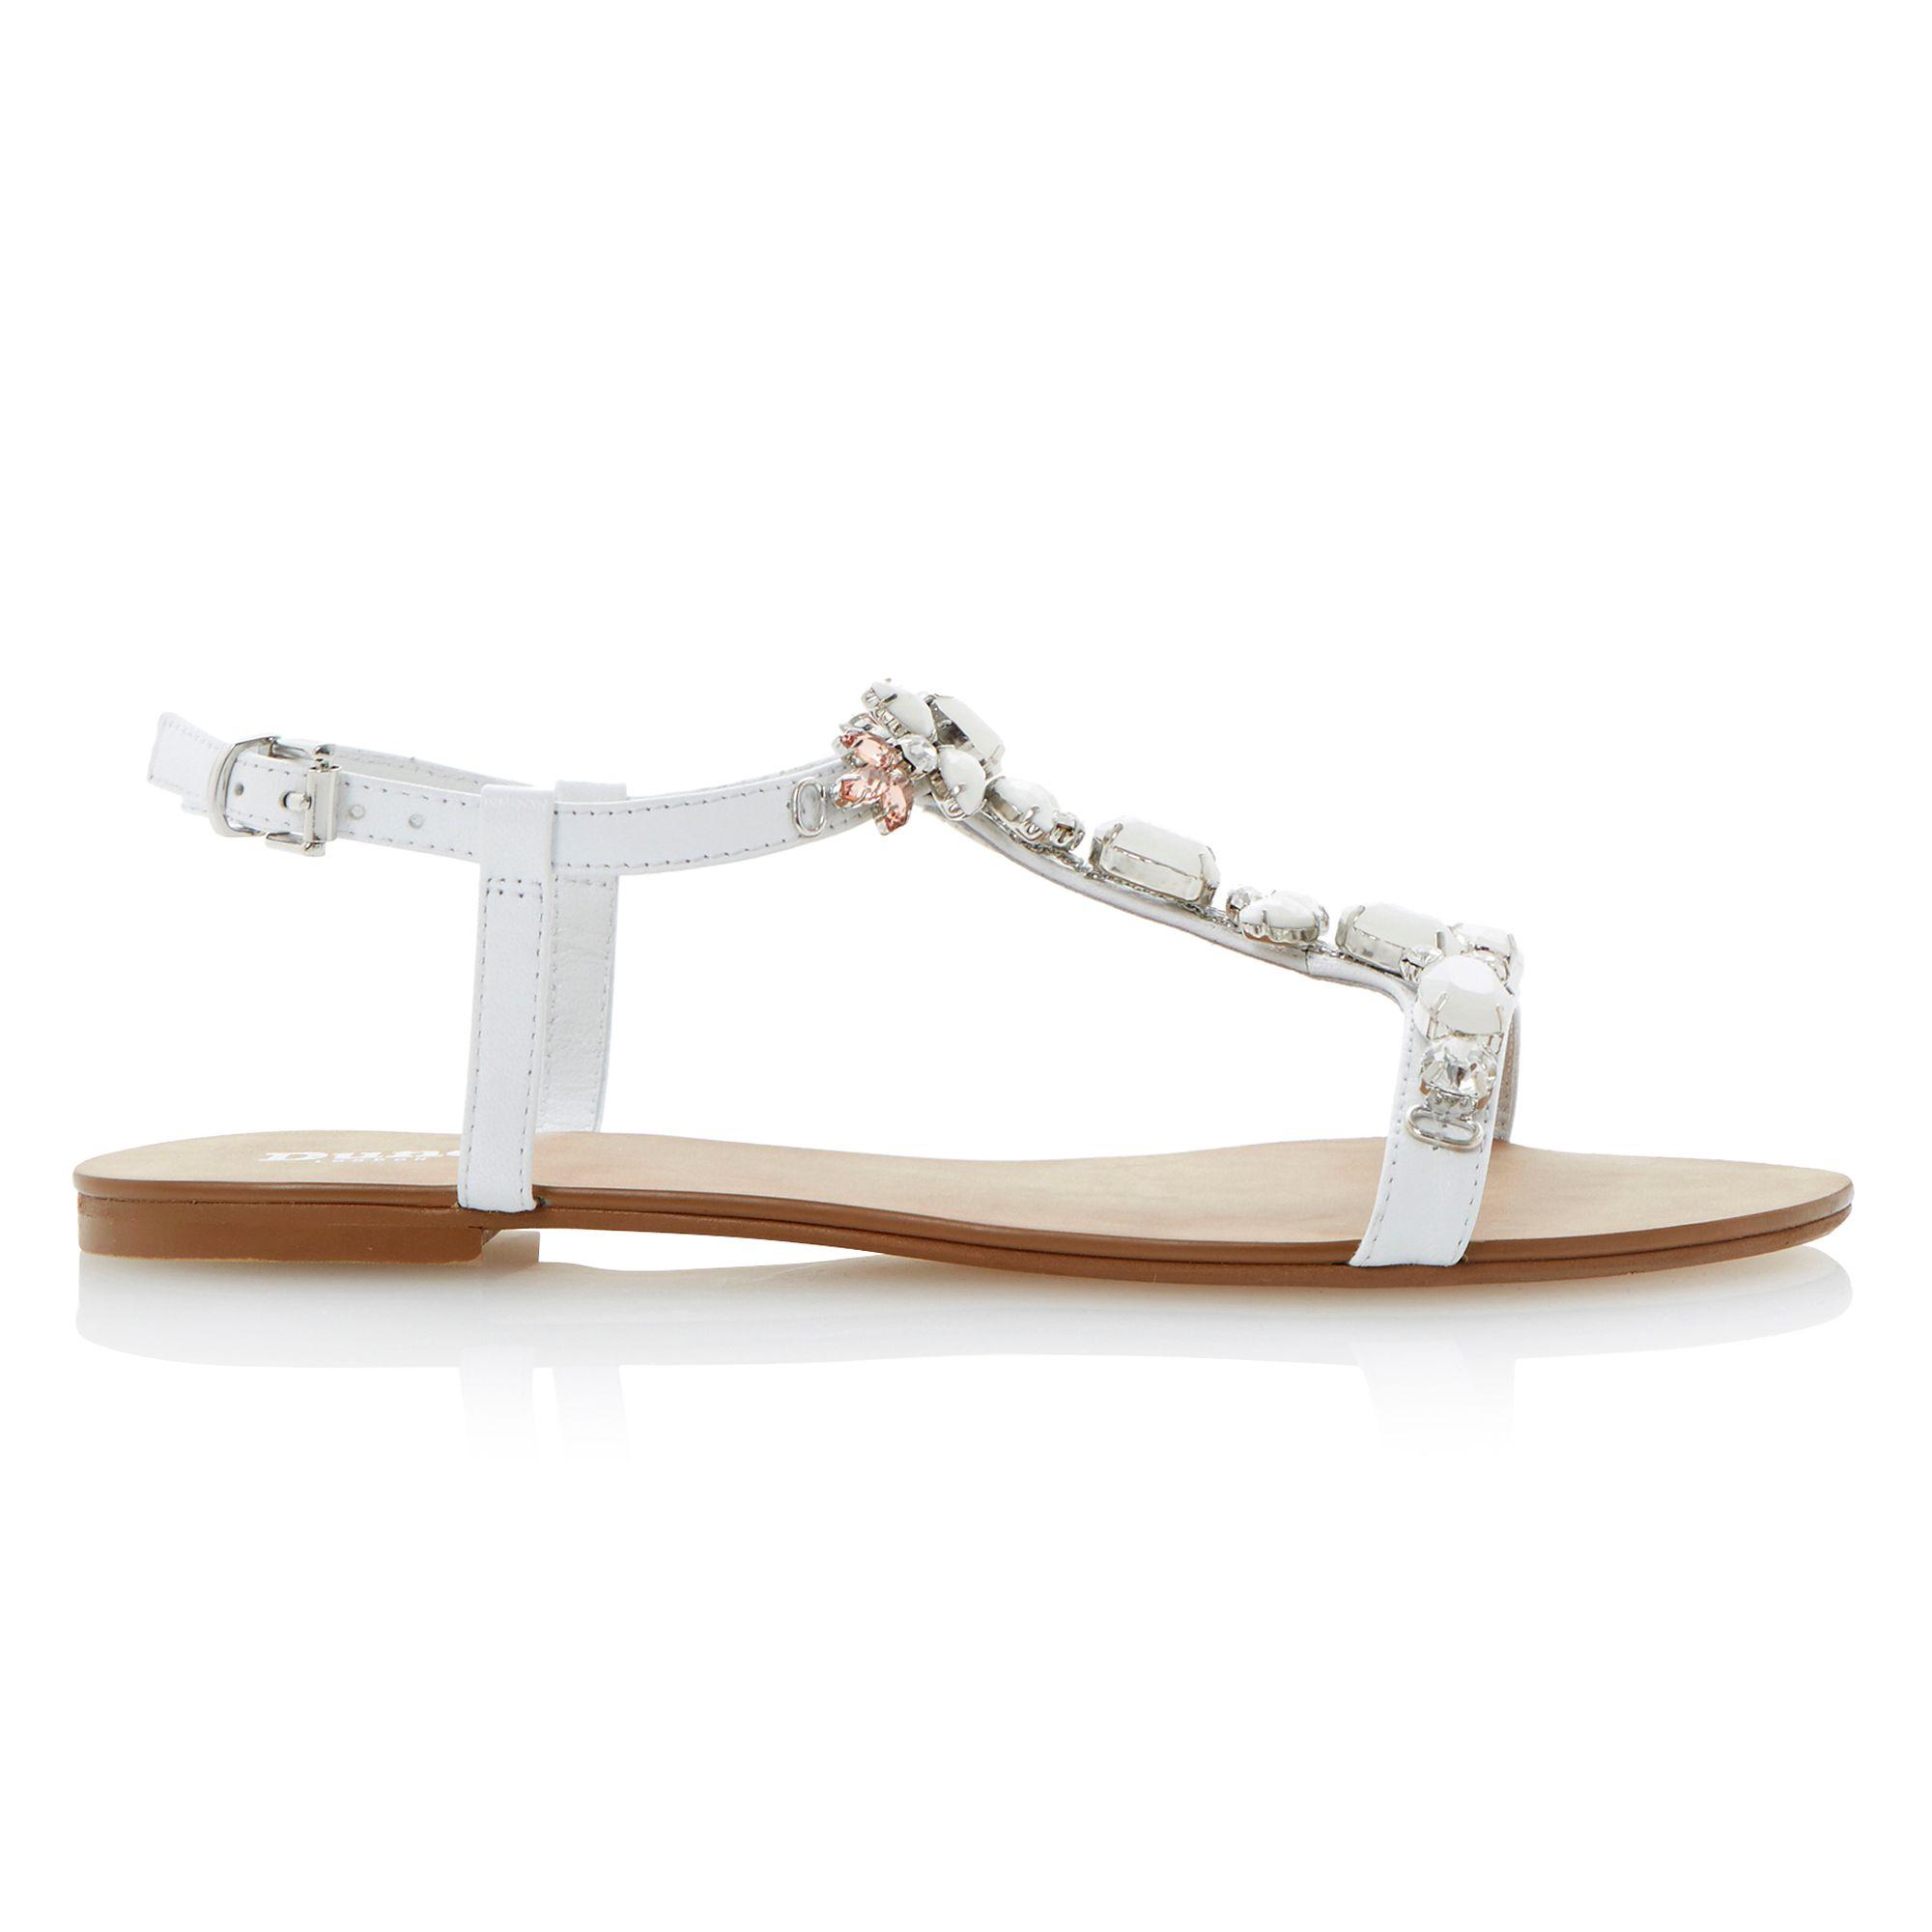 Dune Khloe T-Bar Embellished Leather Strappy Flat Sandals -5437